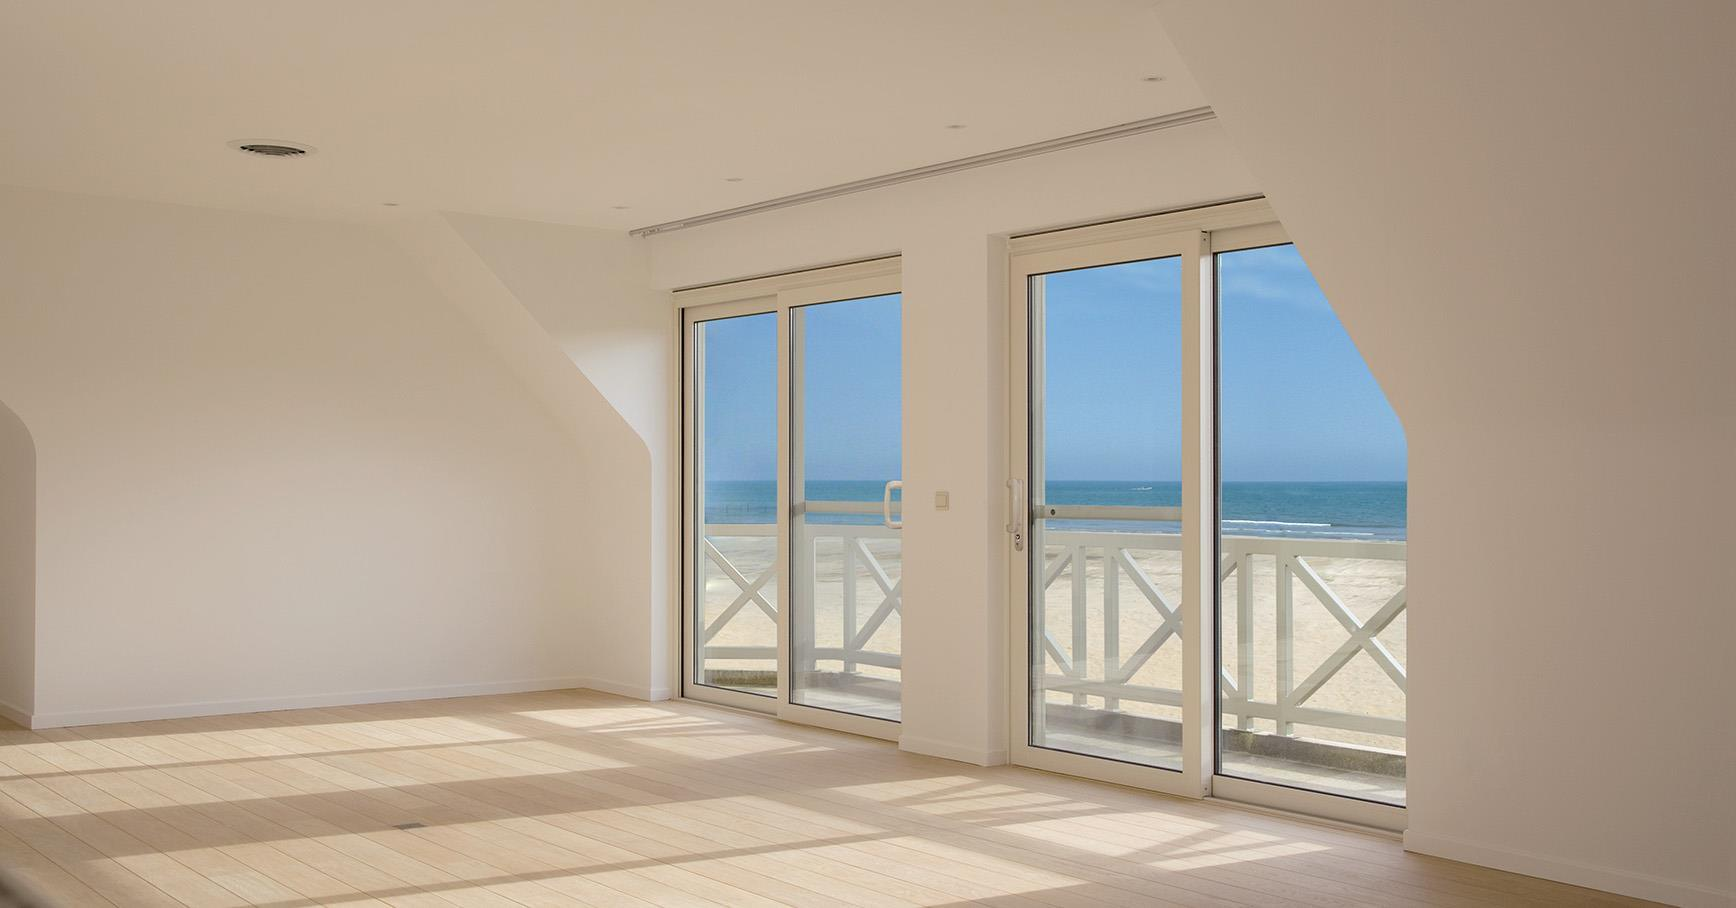 Commercial Aluminum Windows Entry Doors